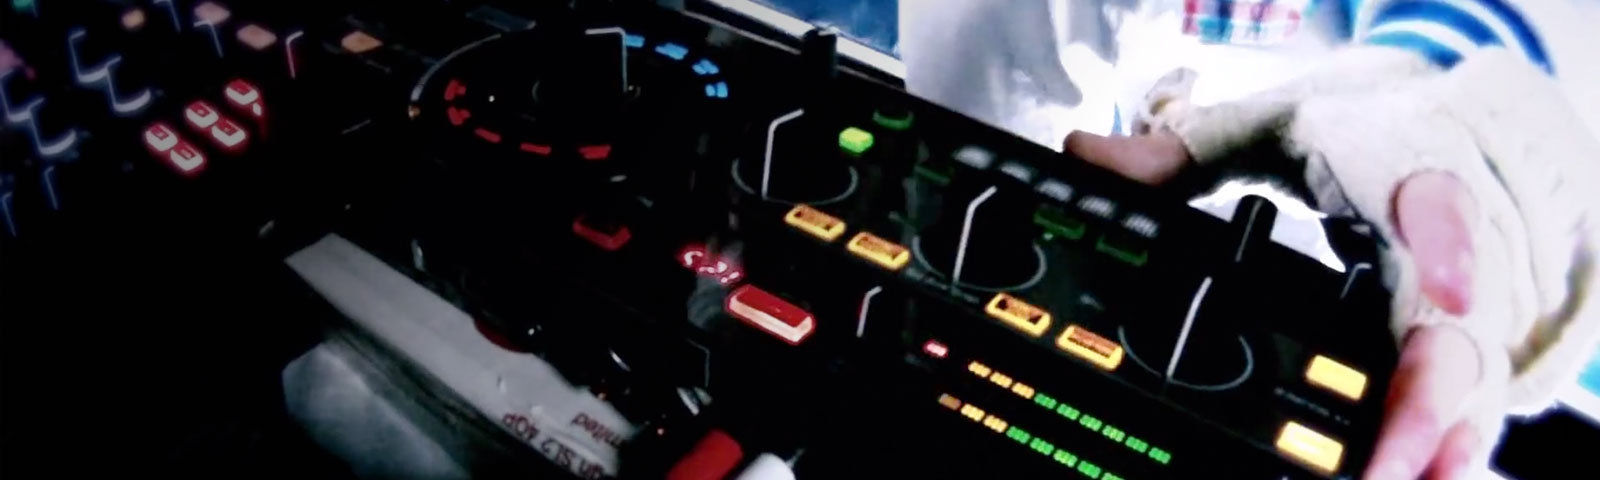 rmx-1000-header-img